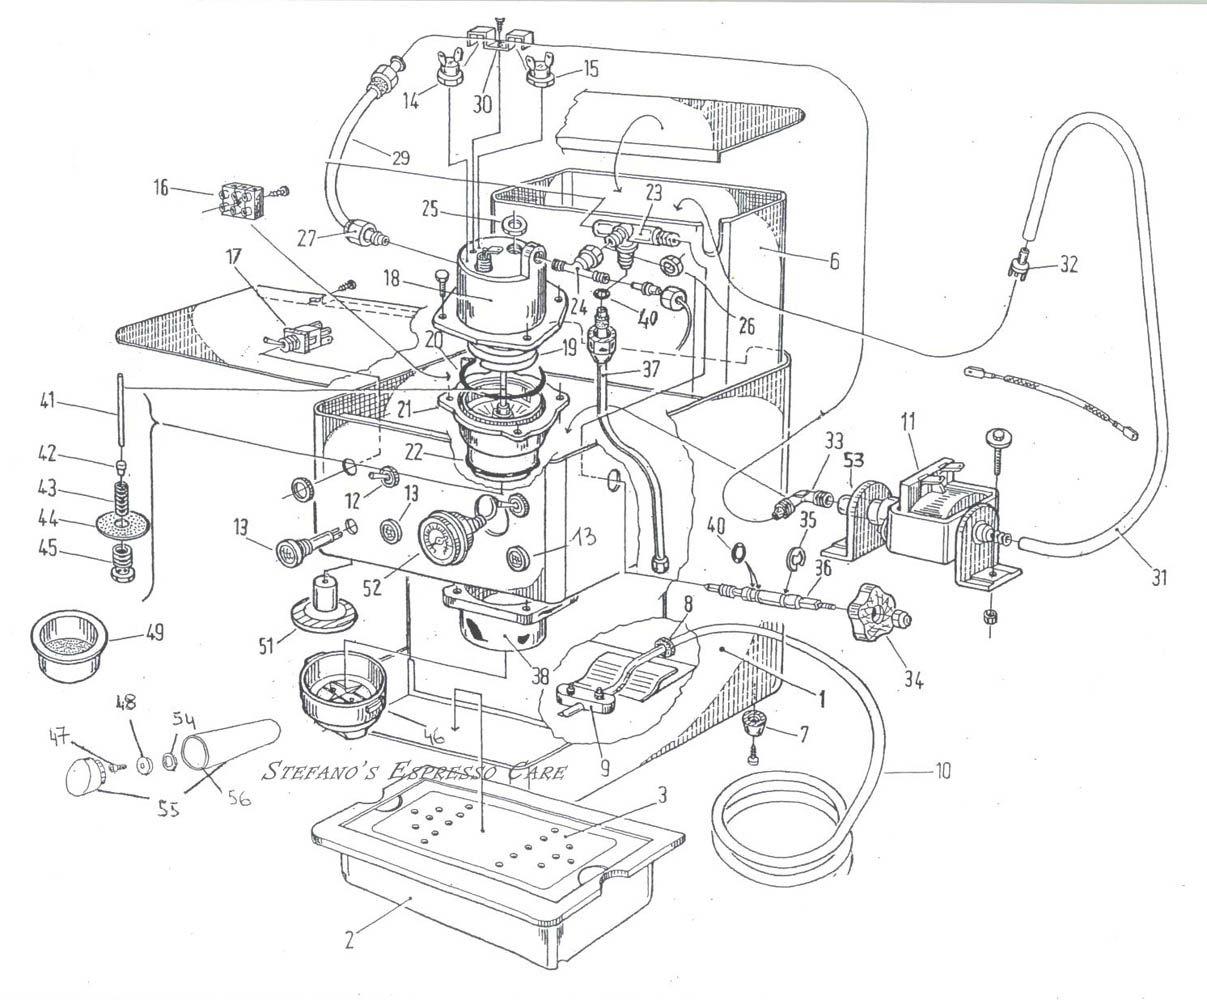 portafilter schematic